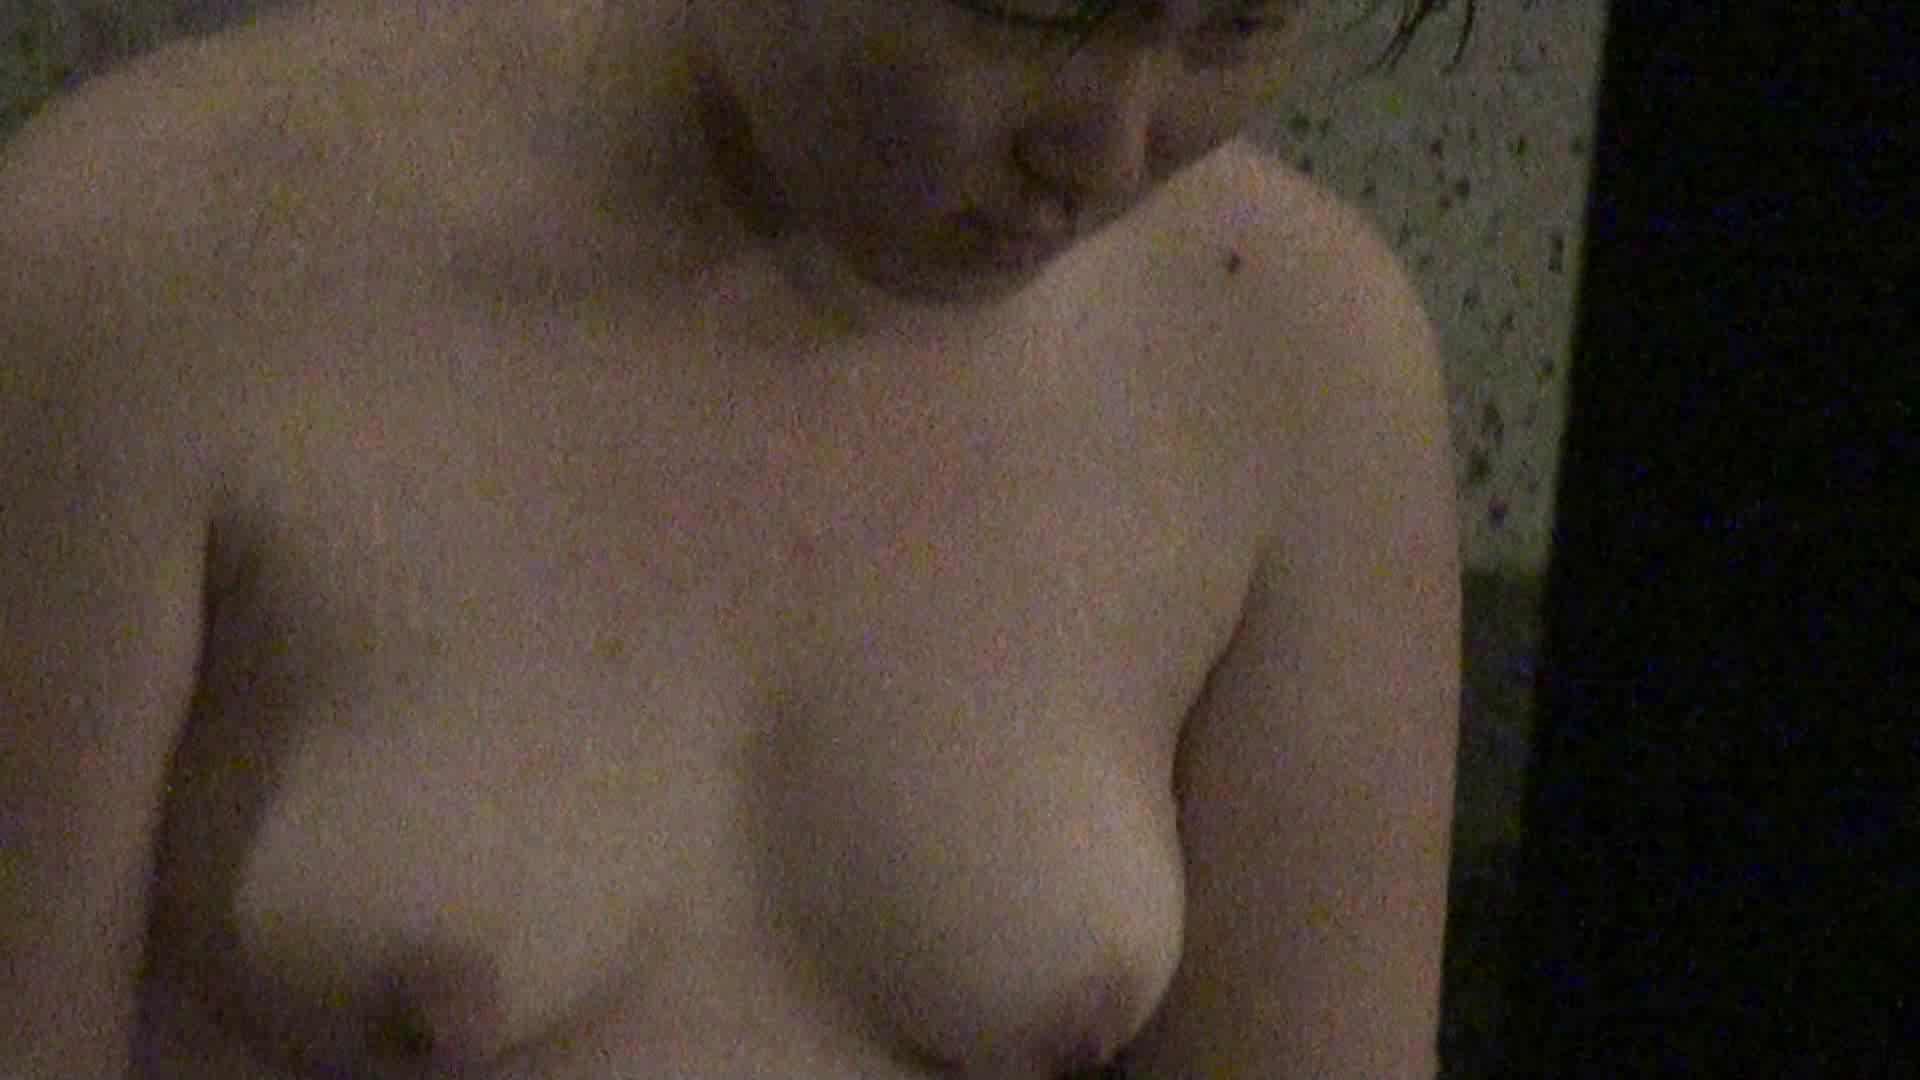 Aquaな露天風呂Vol.334 露天風呂突入 のぞき動画画像 102pic 50